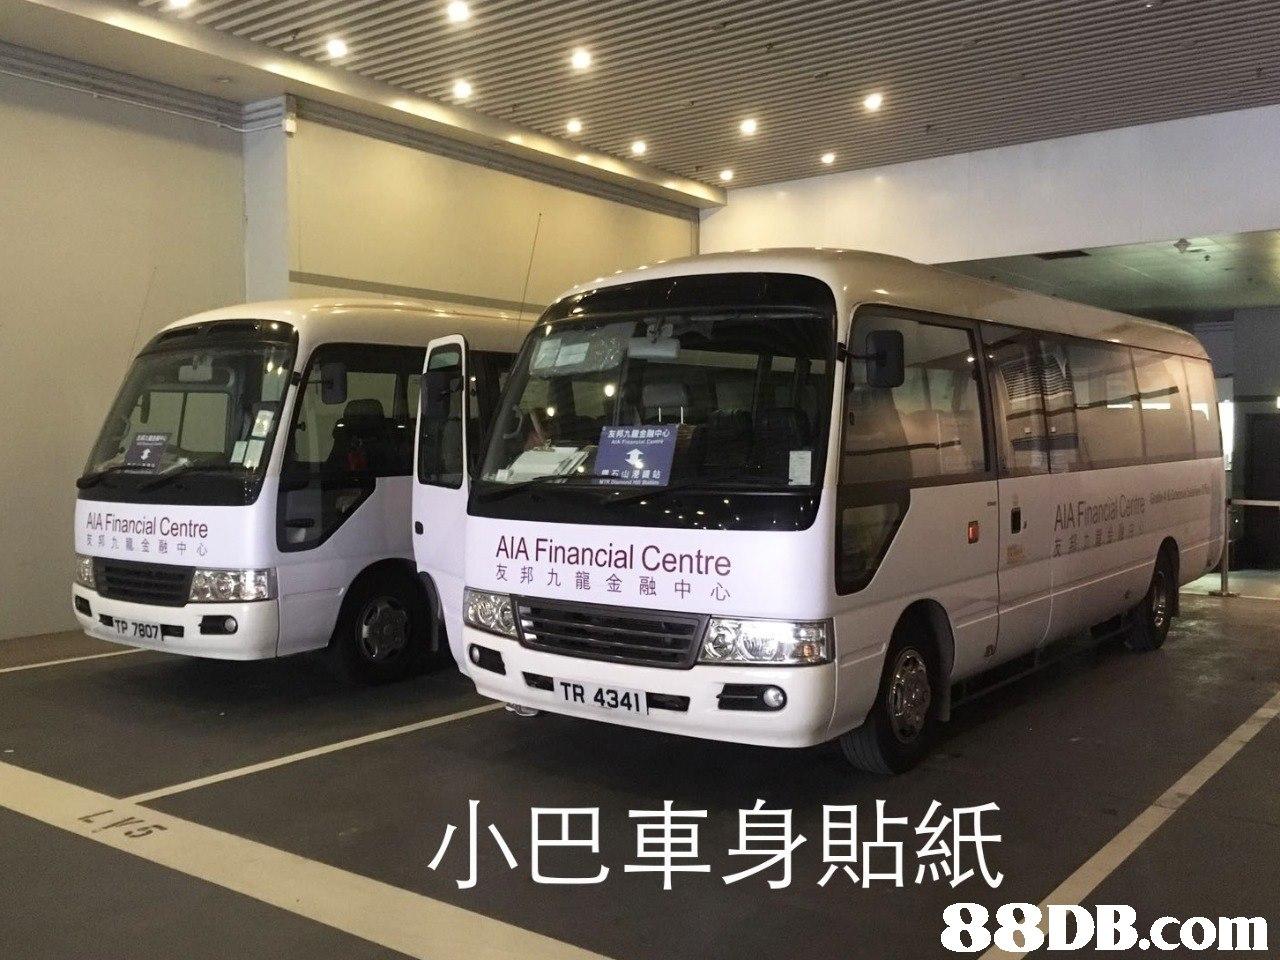 AIA Financial Centre 友邦九龍金融中心 友邦71金融中心 小巴車身貼紙   Land vehicle,Vehicle,Bus,Transport,Mode of transport